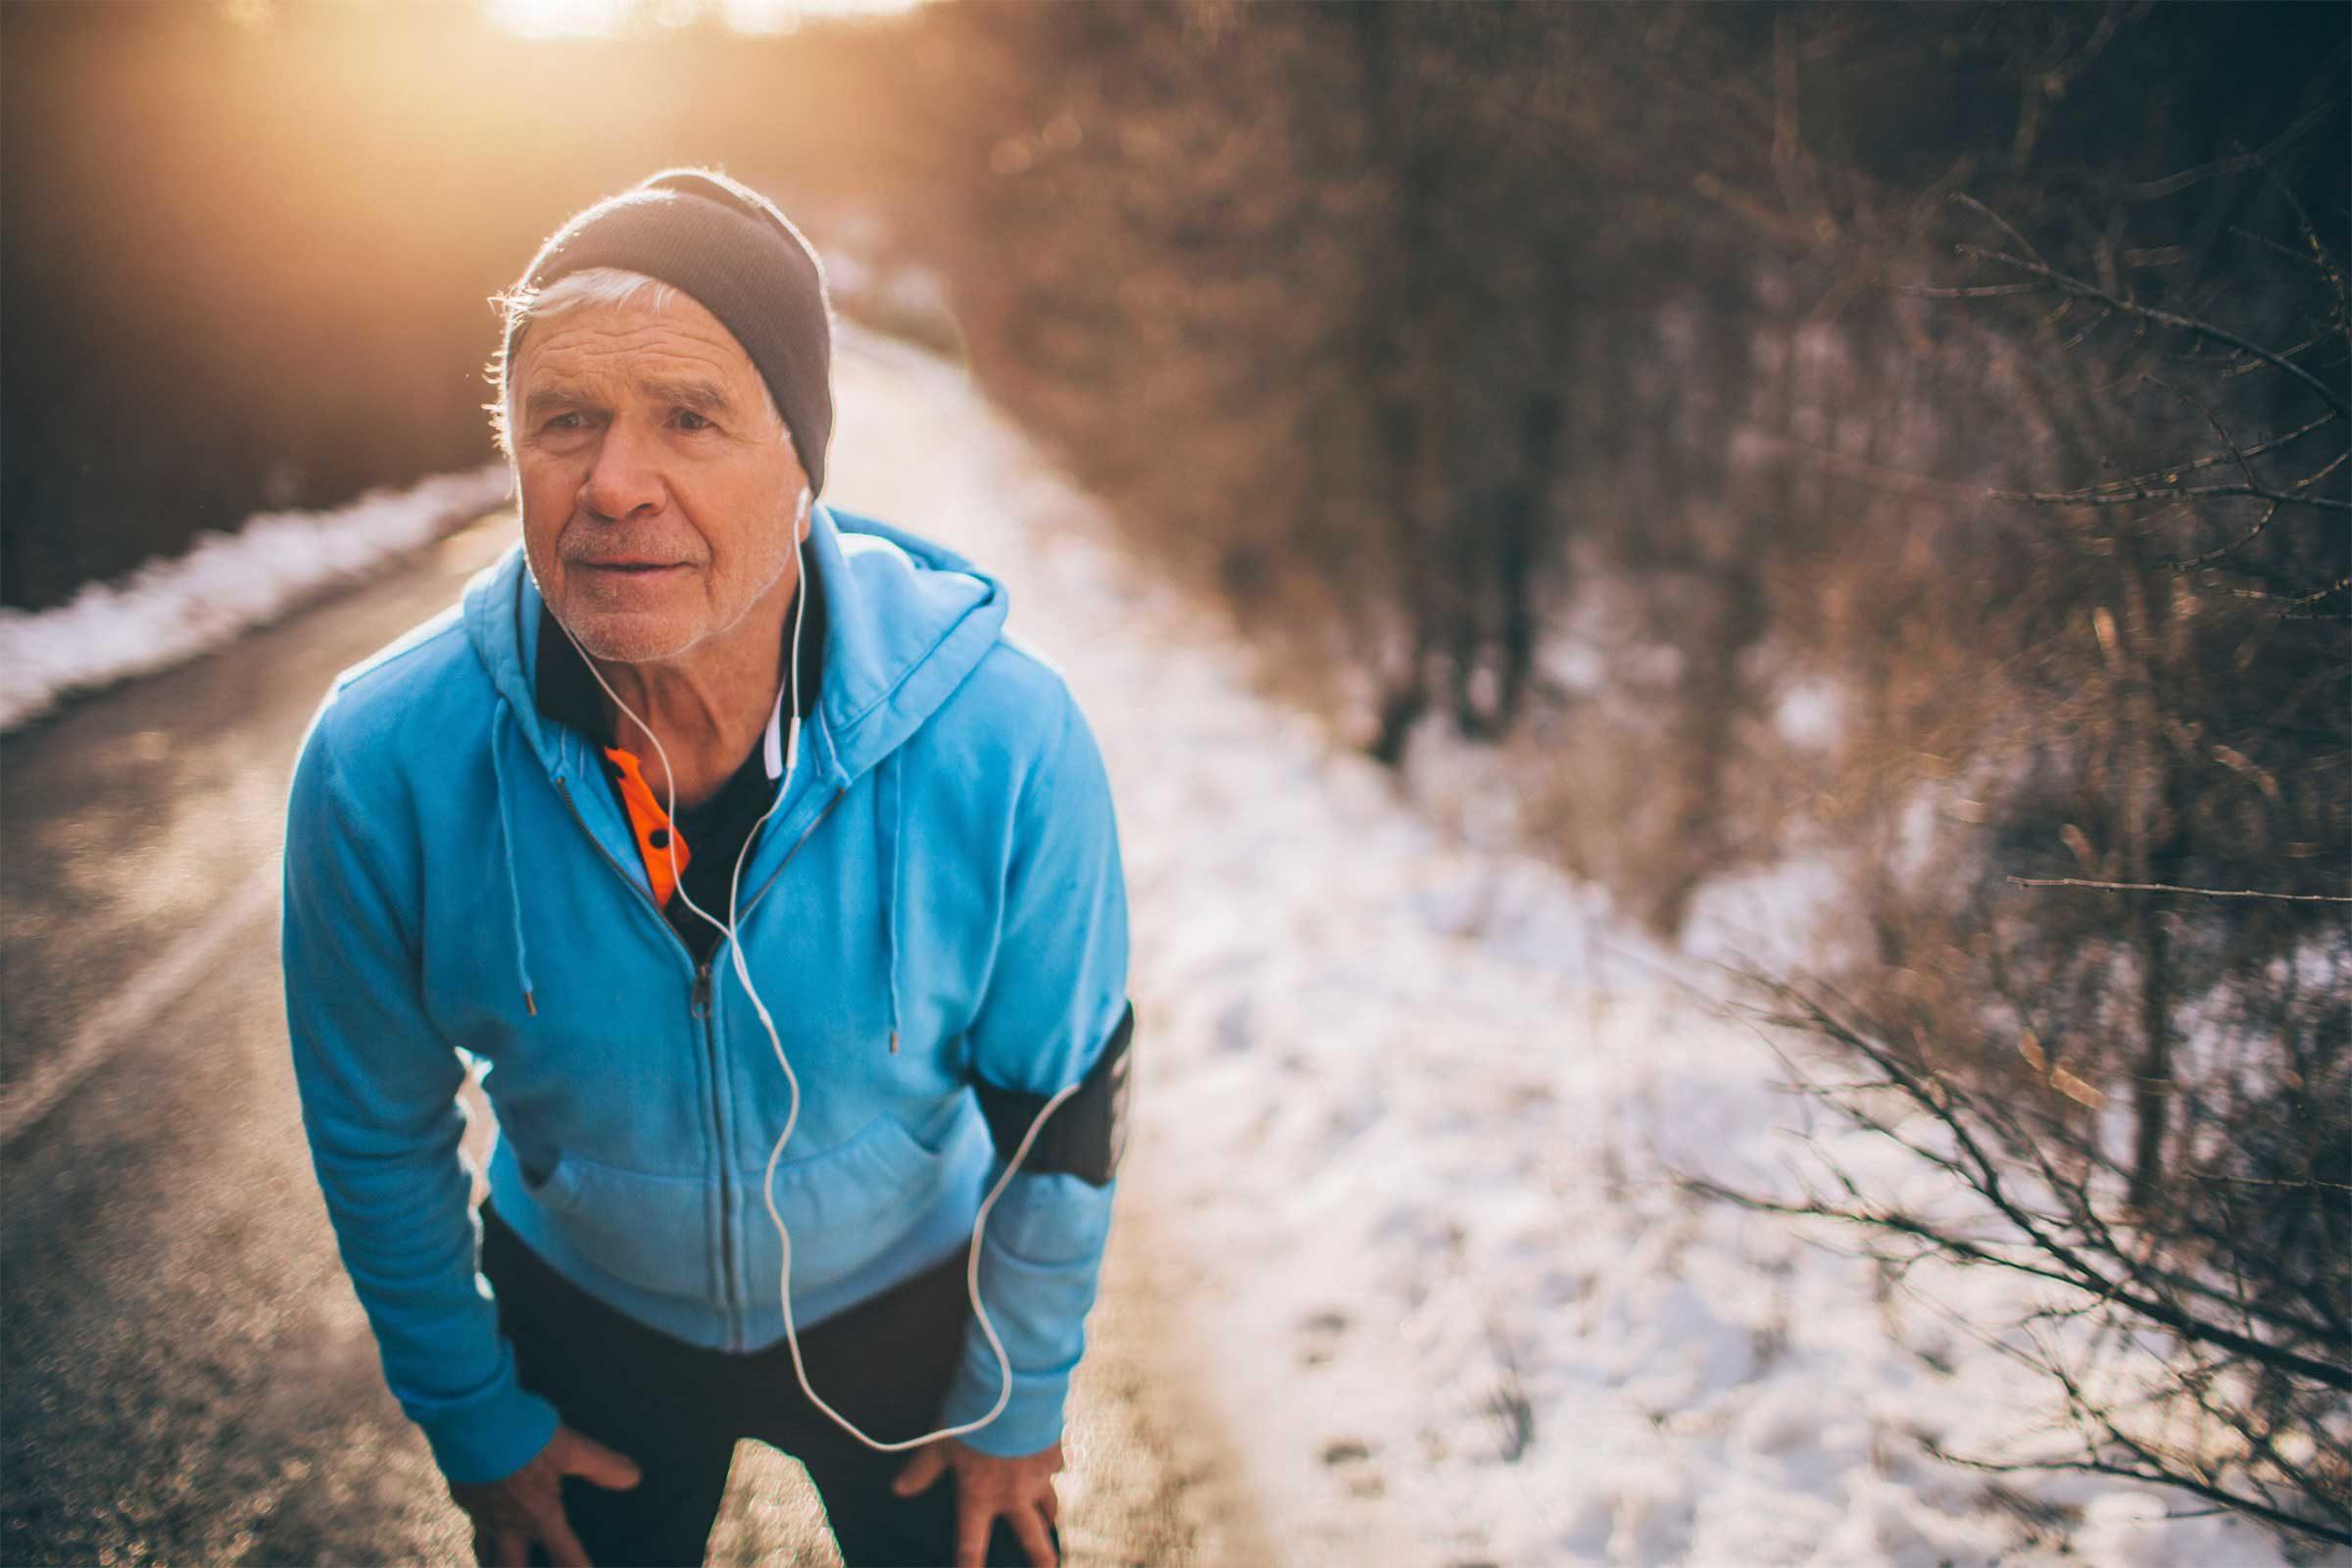 Exercise to feel healthier